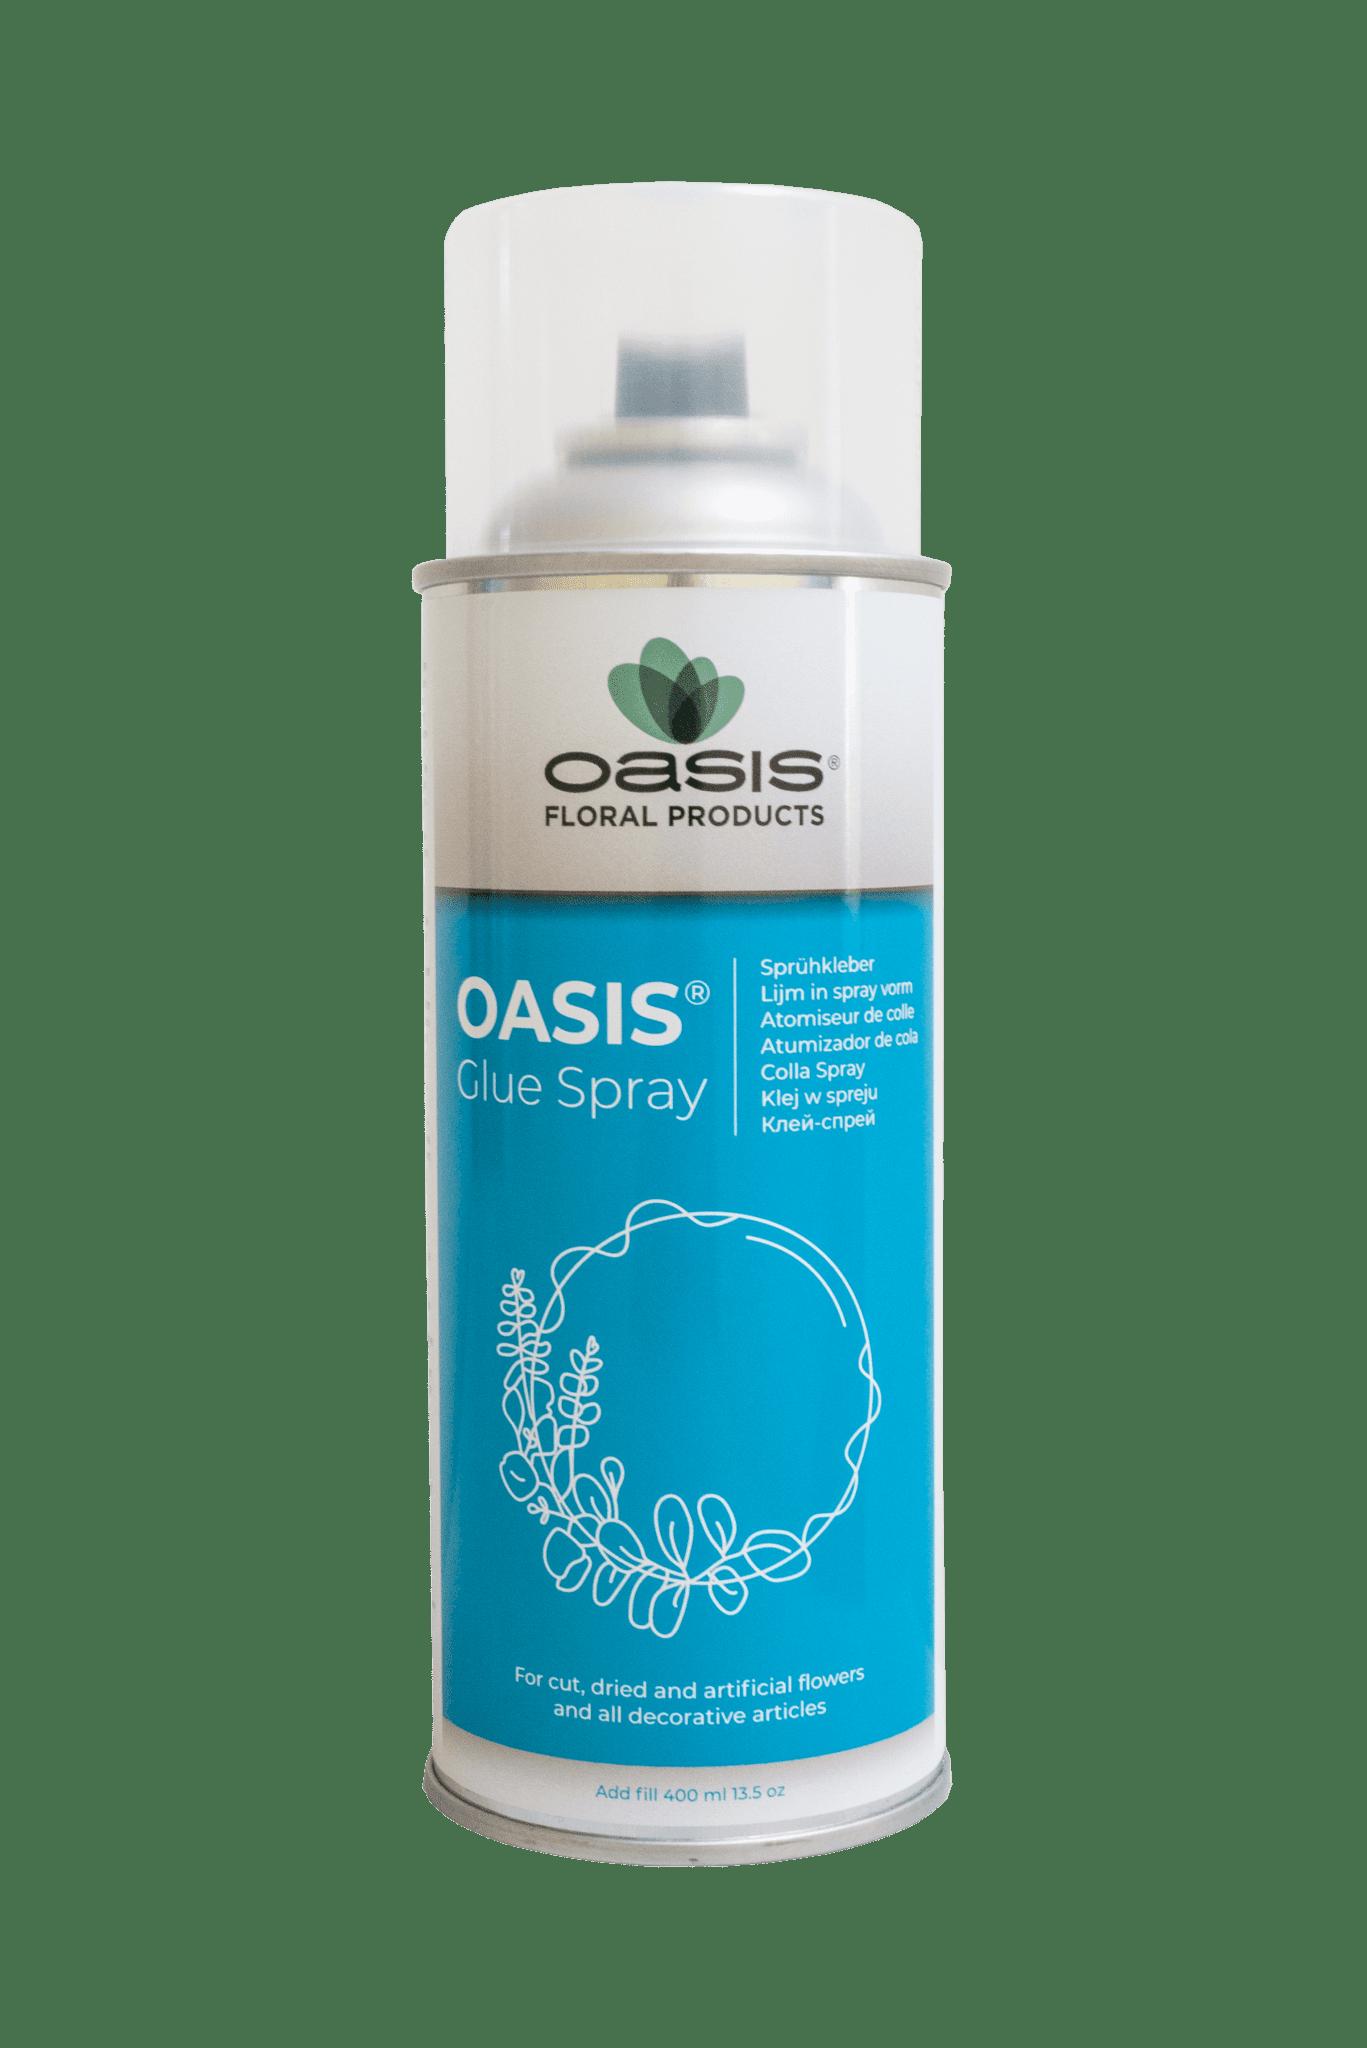 OASIS® Glue Spray